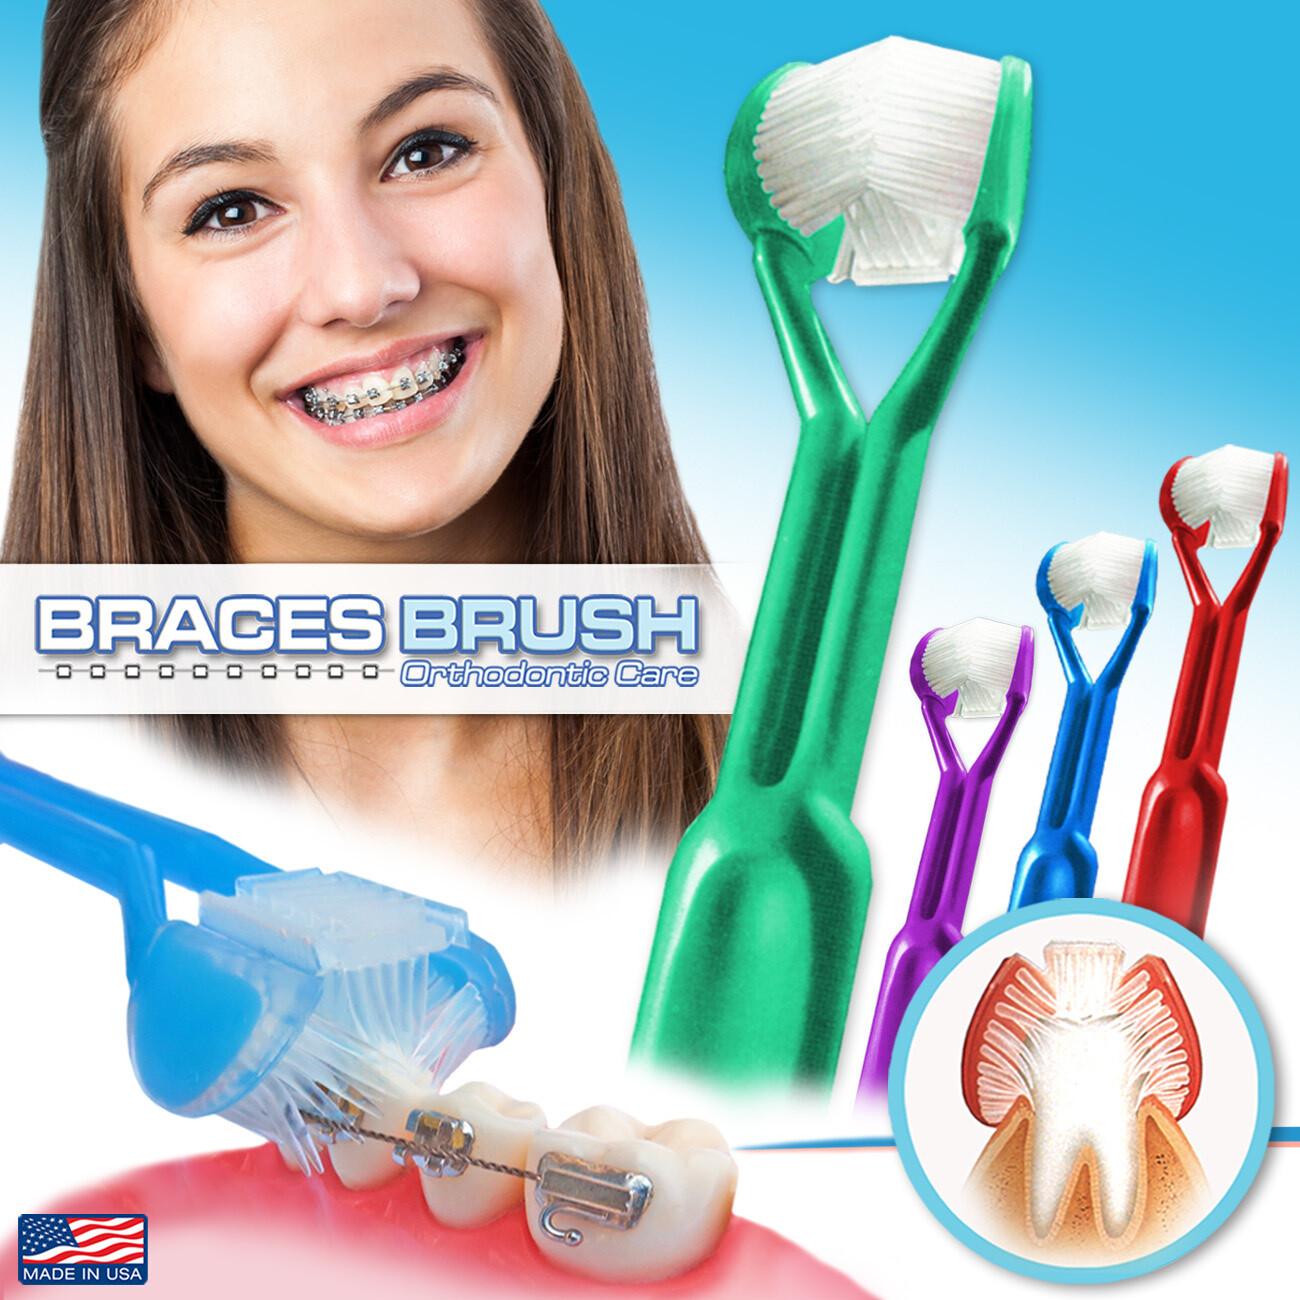 4-PK | DenTrust 3-Sided Braces Brush | The Only Toothbrush Clinically Proven Better for Orthodontic Brackets | Easily Brush Better & Prevent Gum Disease | Tongue Cleaner for Fresh Breath | MADE IN USA